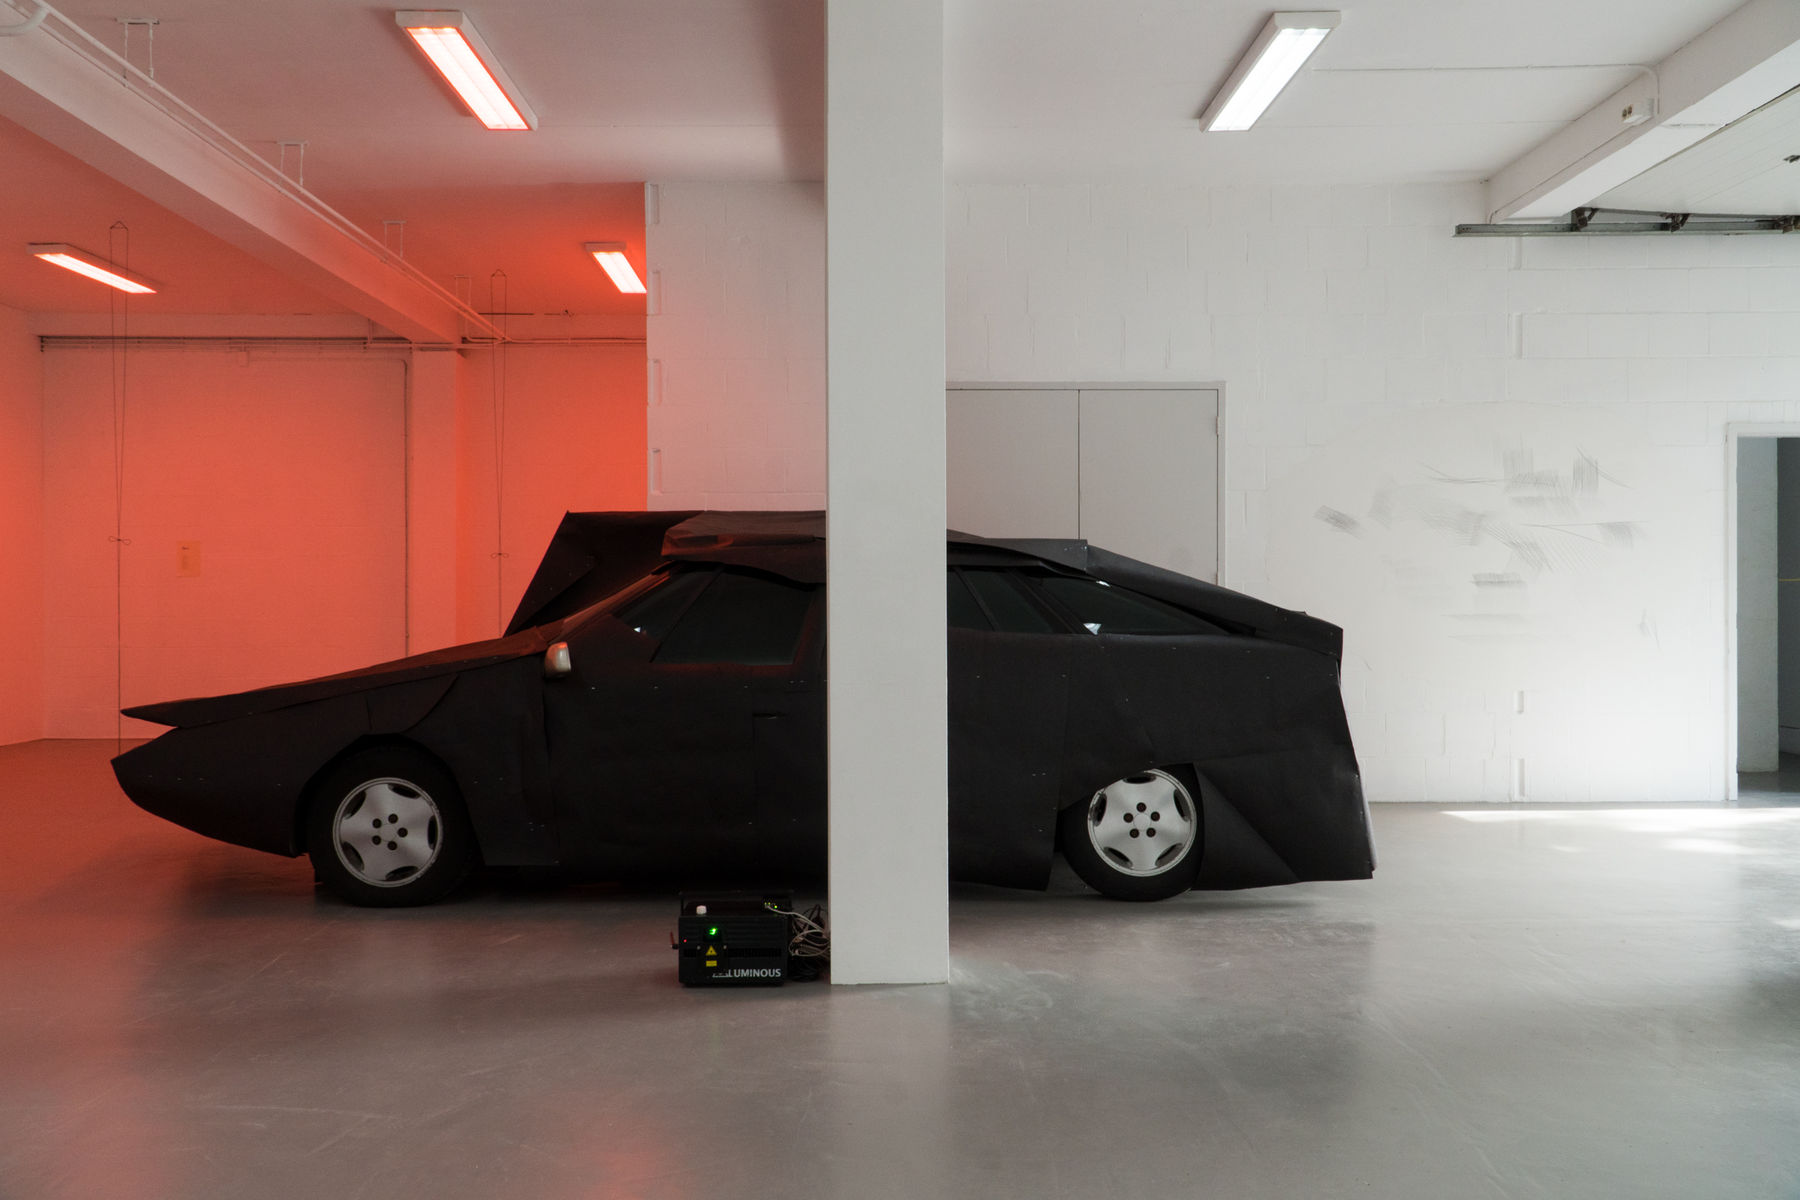 Laura Kaminskaitė And Antanas Gerlikas At PAKT Art Viewer - Car meets today near me